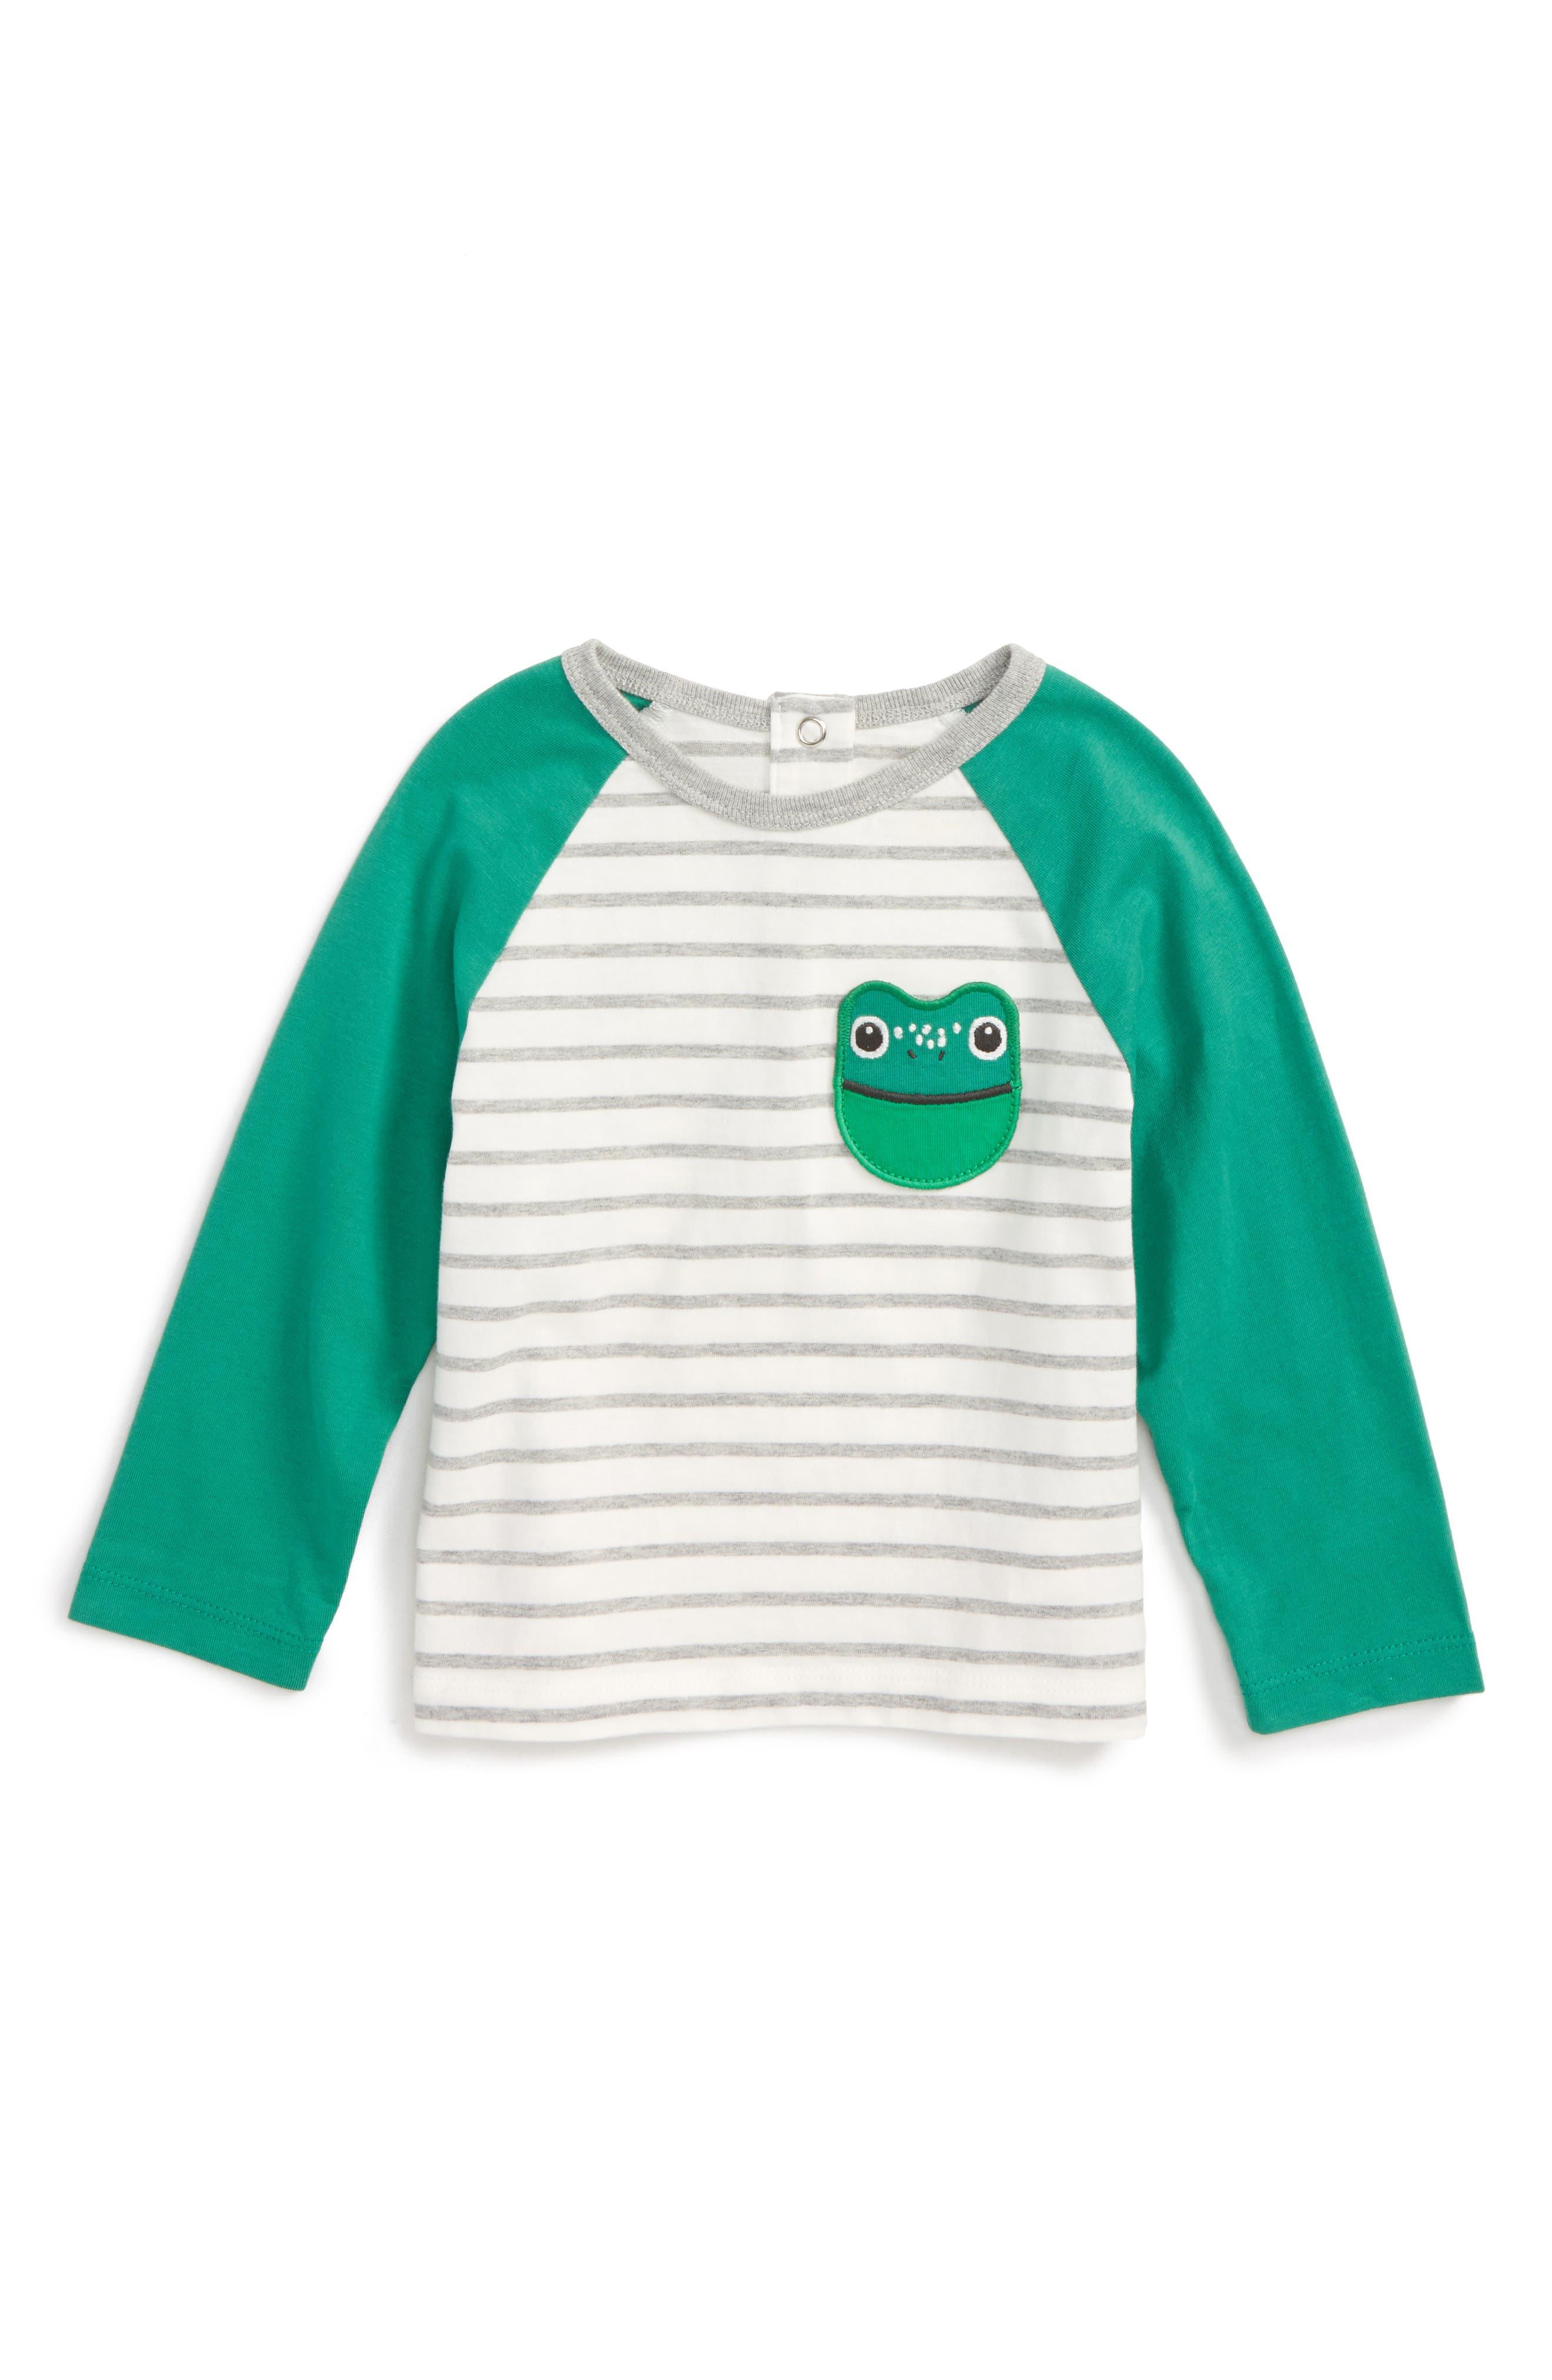 Pocket Pet T-Shirt,                             Main thumbnail 1, color,                             901